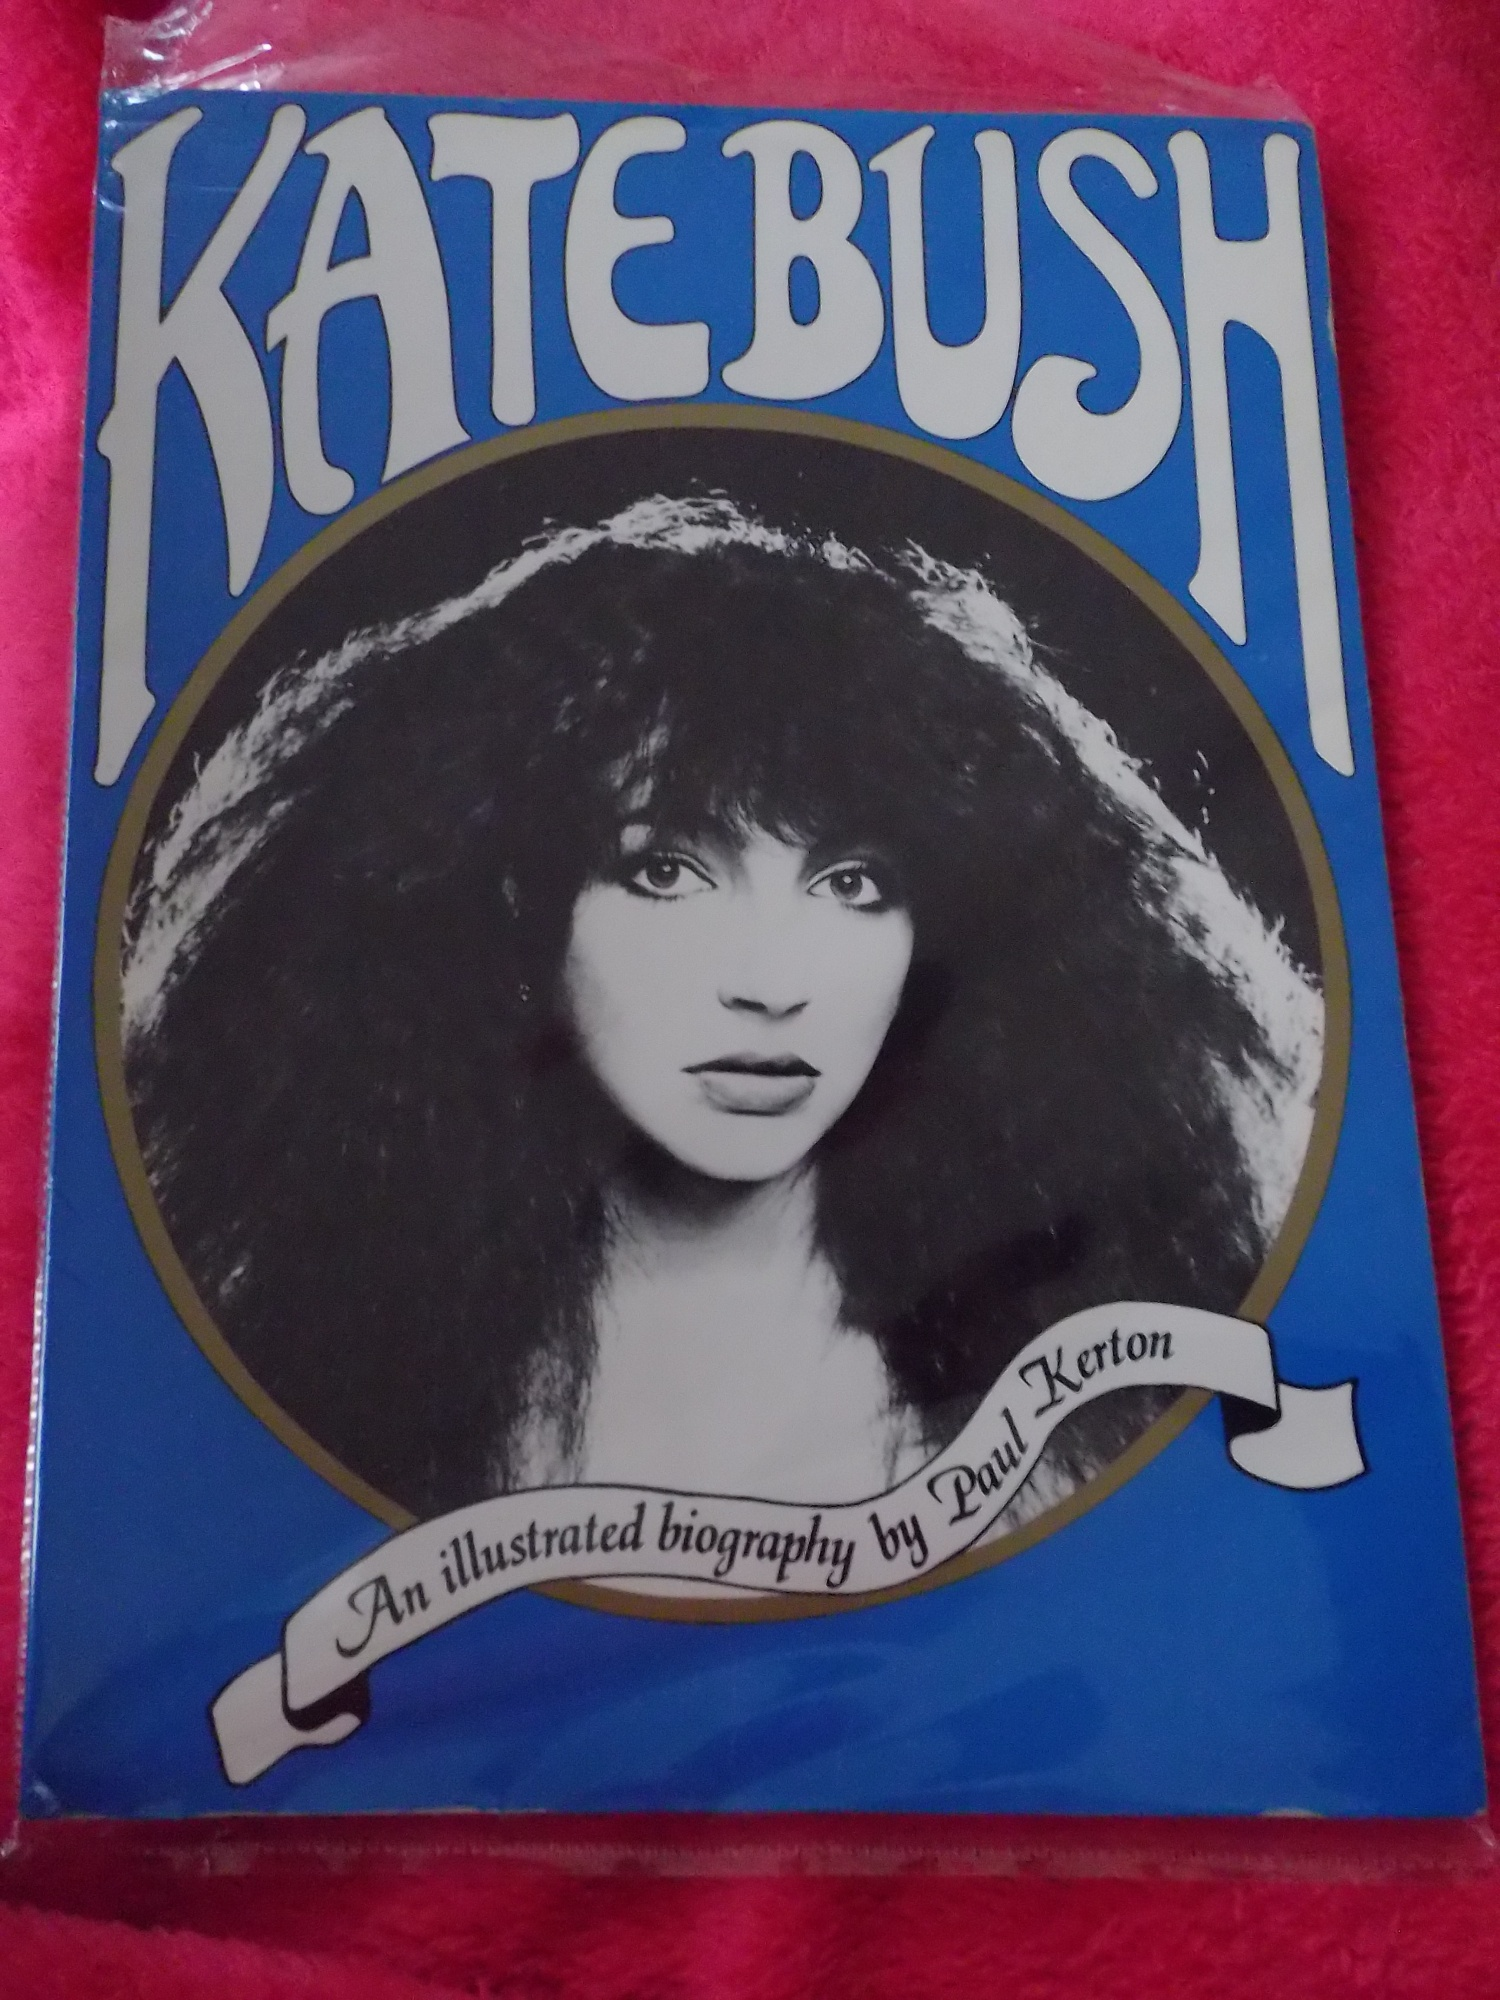 Les livres sur Kate  YjgAh9idRbpQV7kslp8lxAZ-bfY